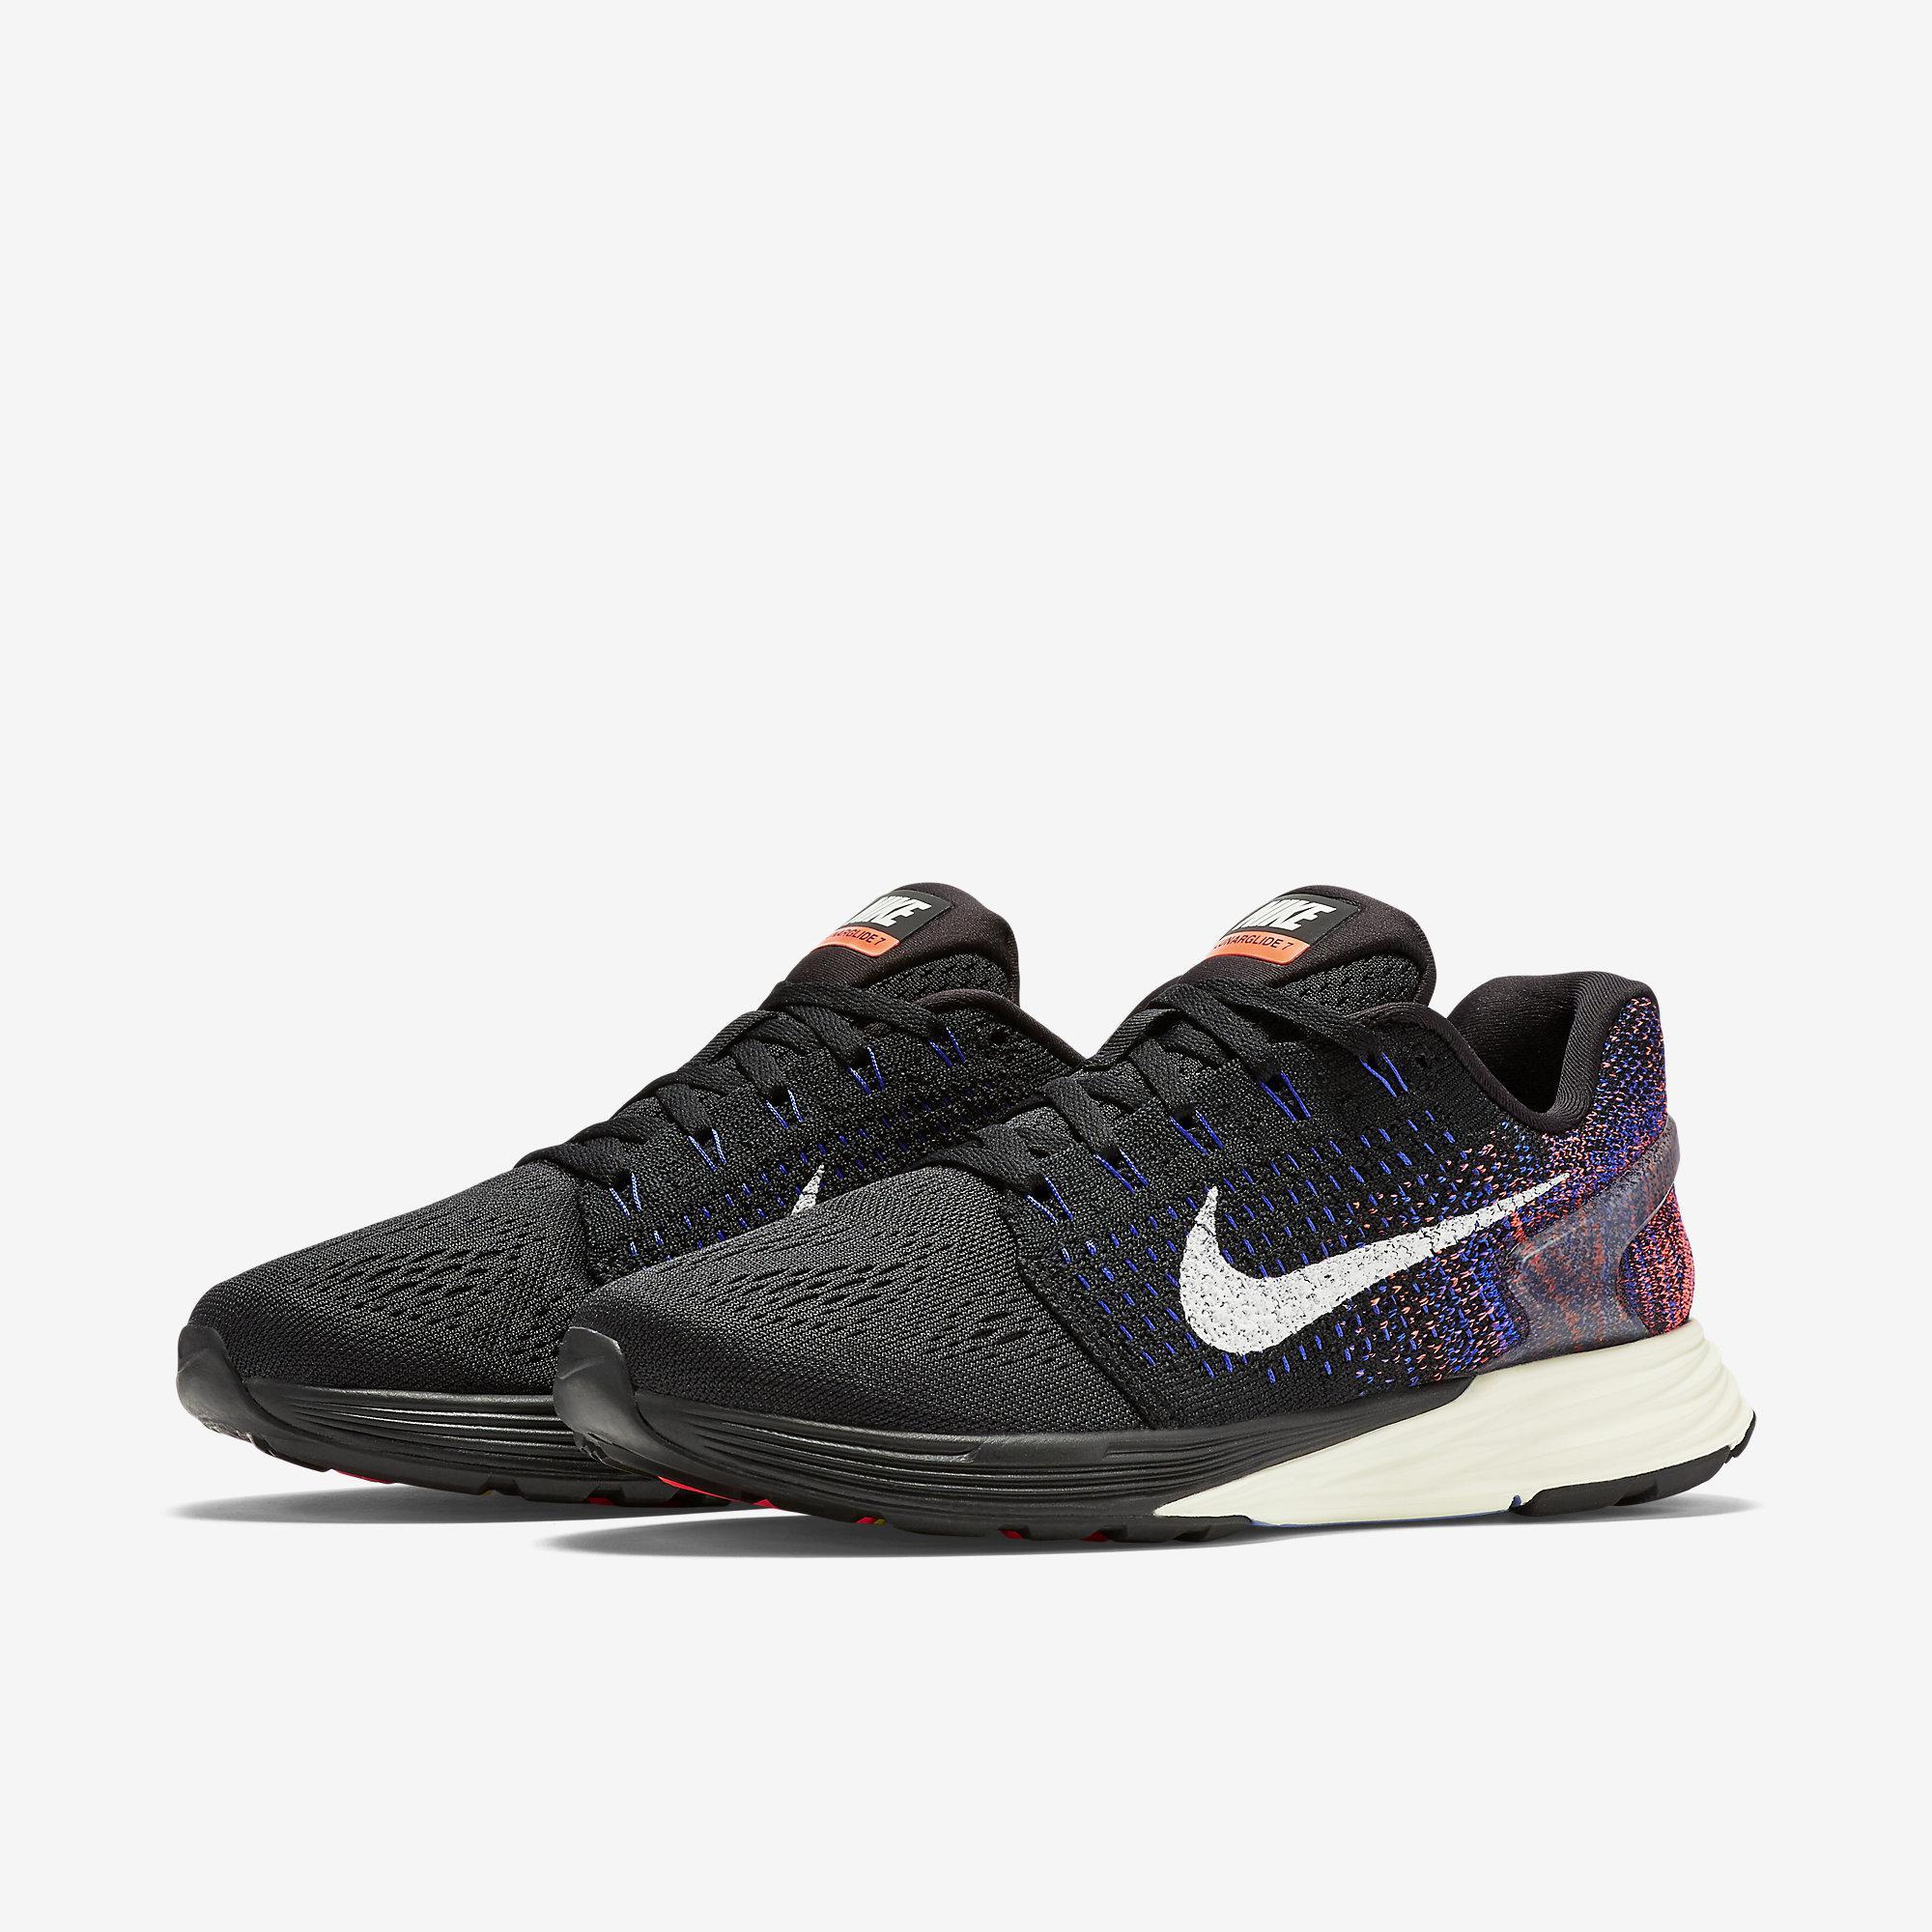 new product d01ce a4d87 ... order nike womens lunarglide 7 running shoes black blue orange a5e82  a996e